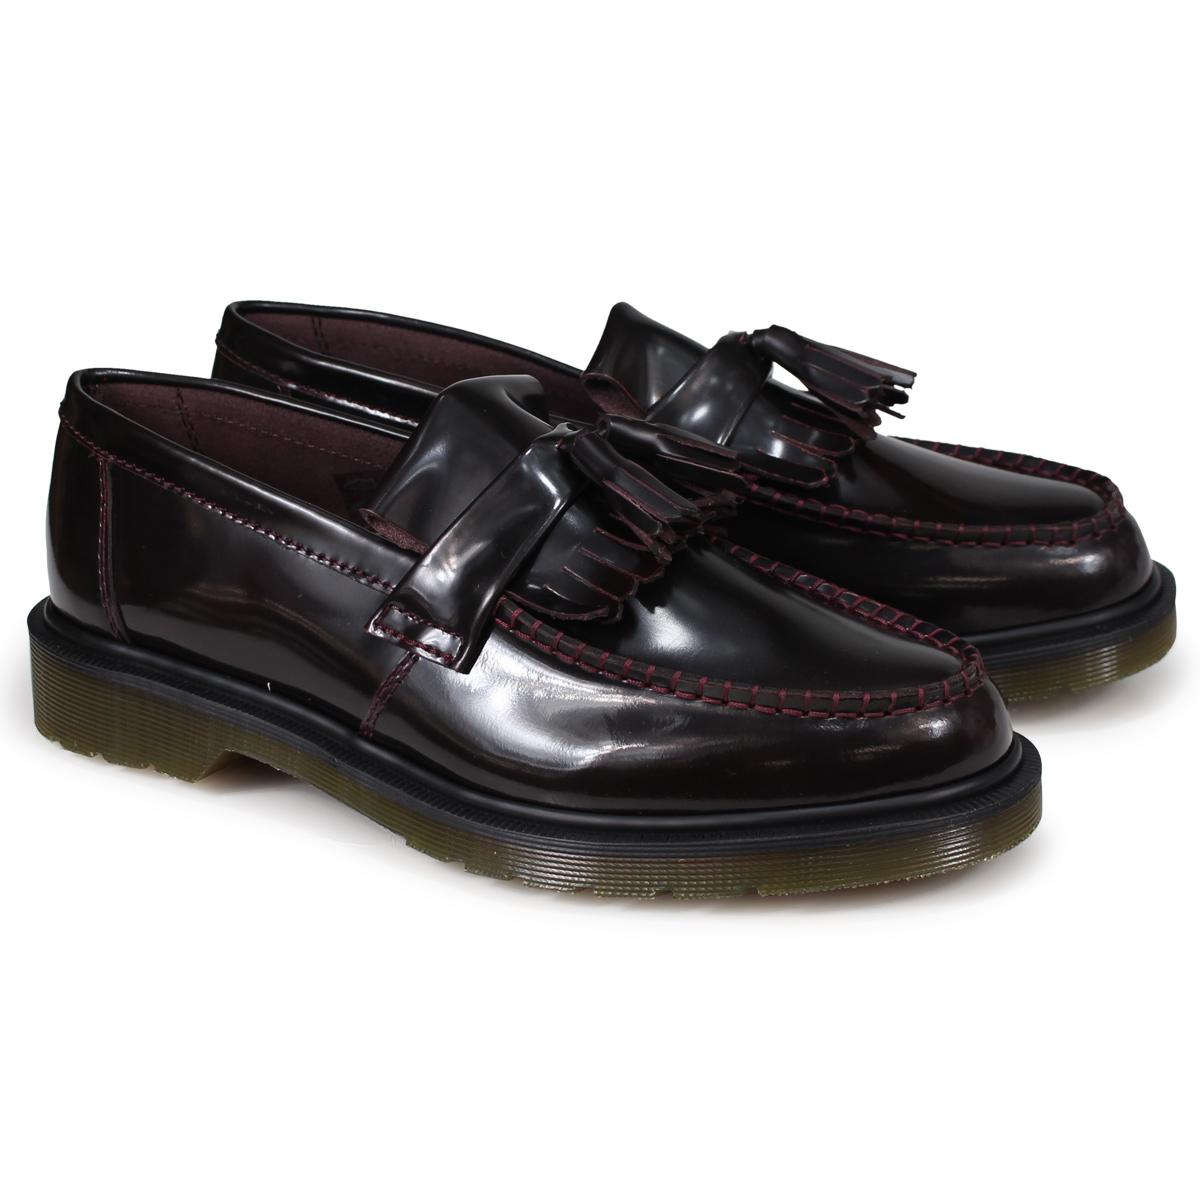 Whats up Sports   Rakuten Global Market: Dr.Martens ADRIAN TASSEL LOAFER doctor Martin loafer tassel men gap Dis cherry red R24370600 [9/26 Shinnyu load]